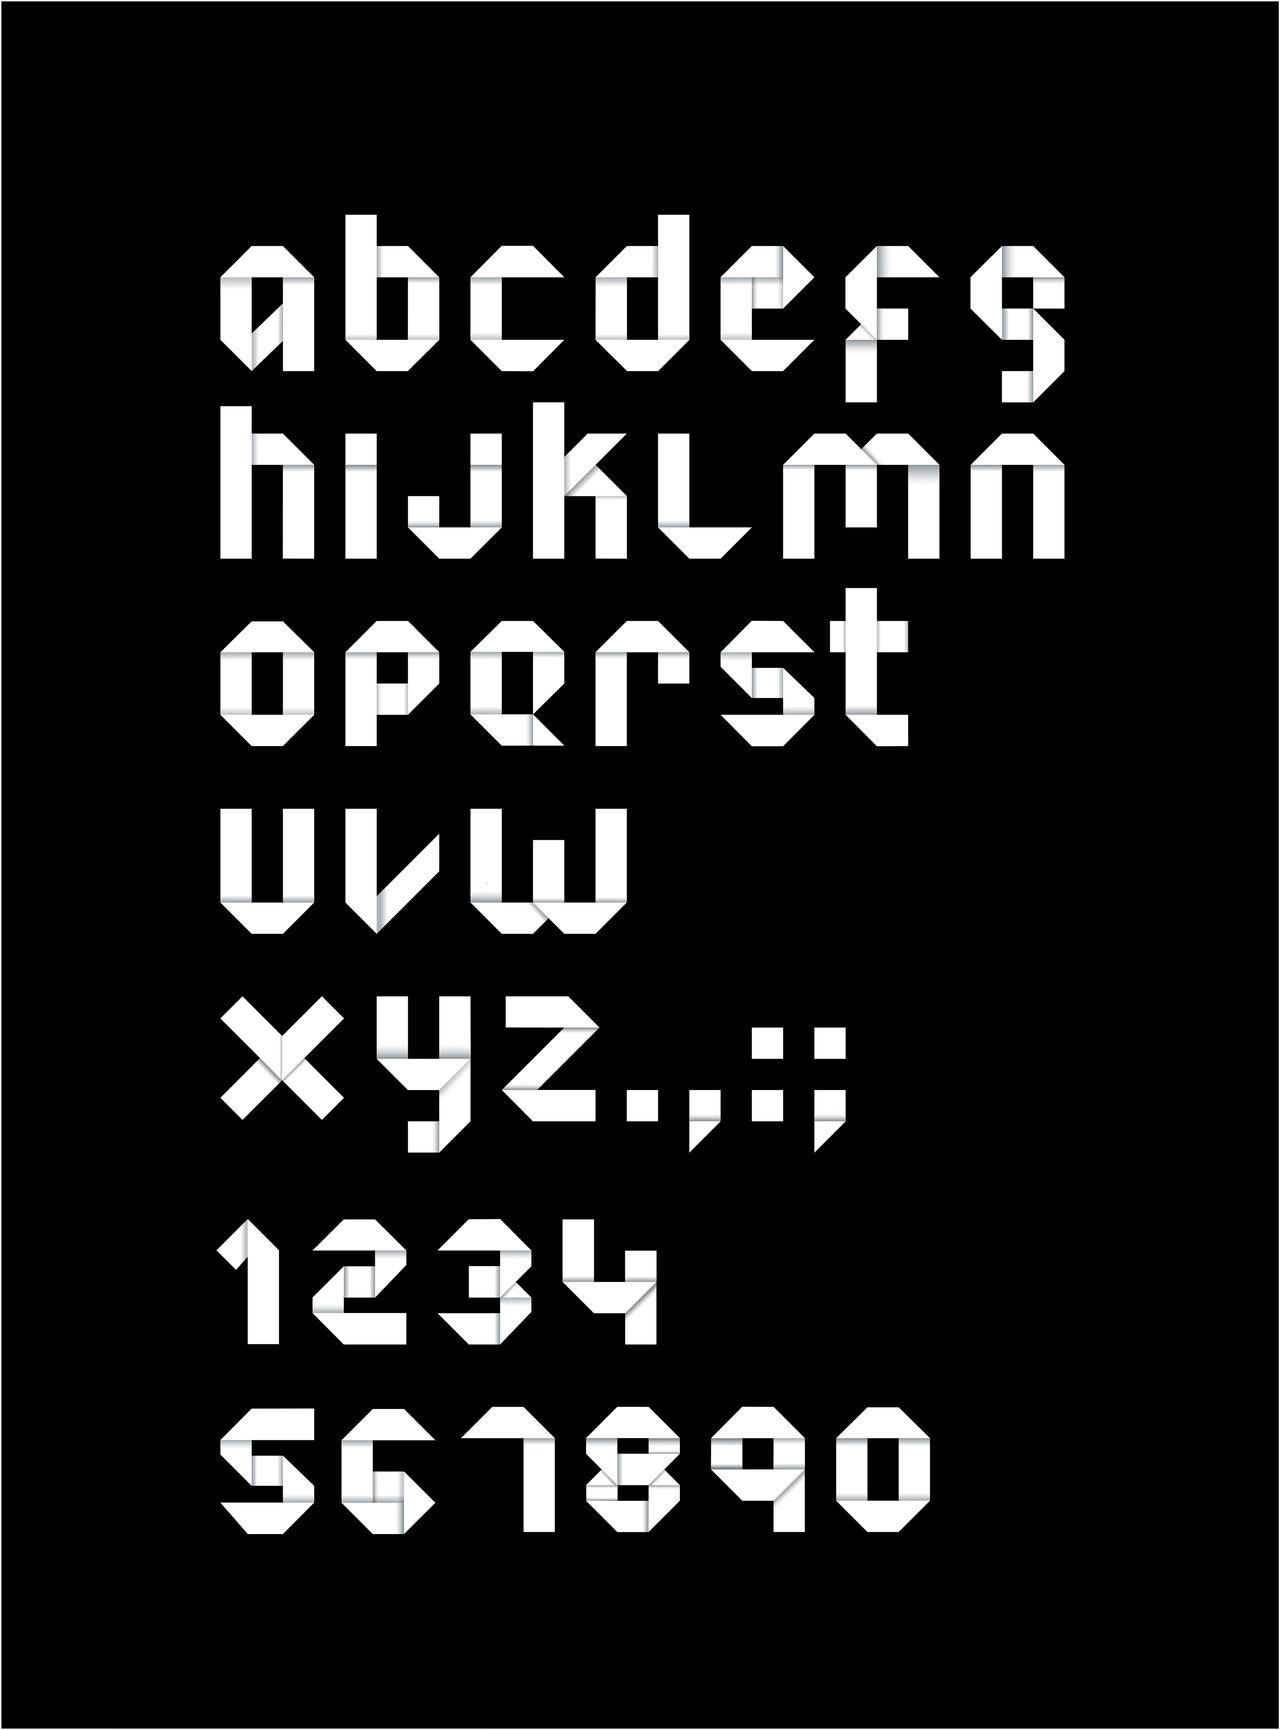 Typography Origami Font By Nicolas Korenchuk Via Behance This